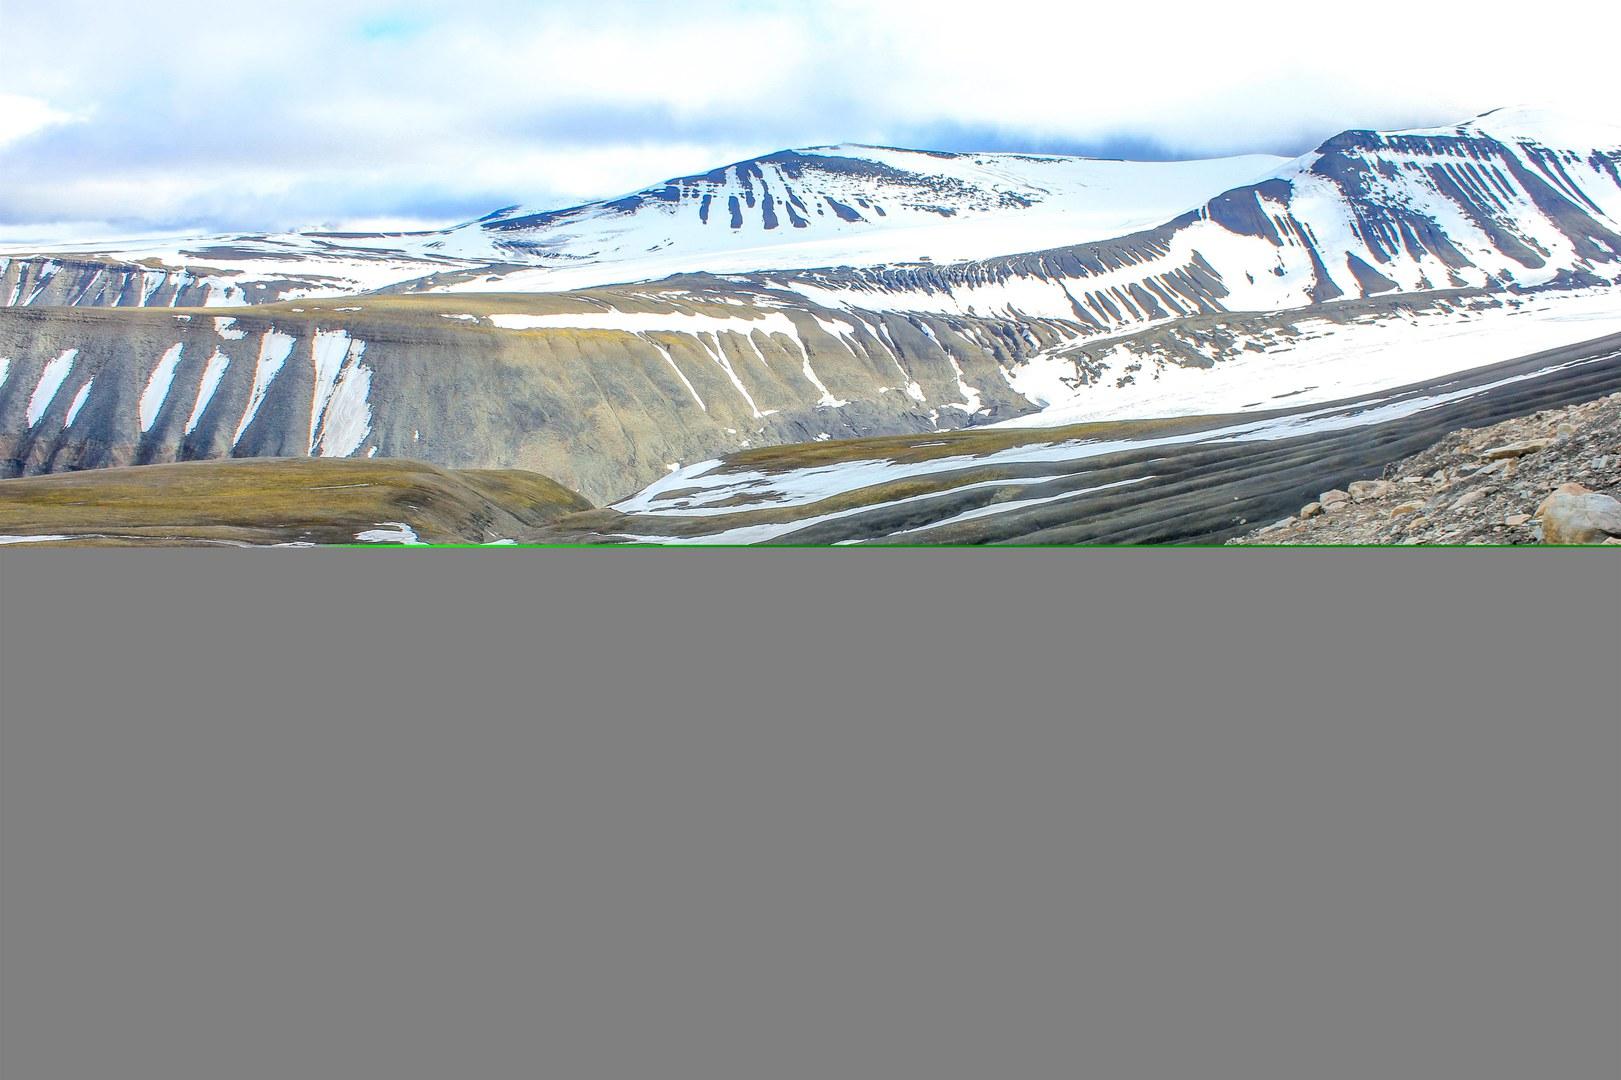 Blick ins Longyearbyen-Tal auf Spitzbergen